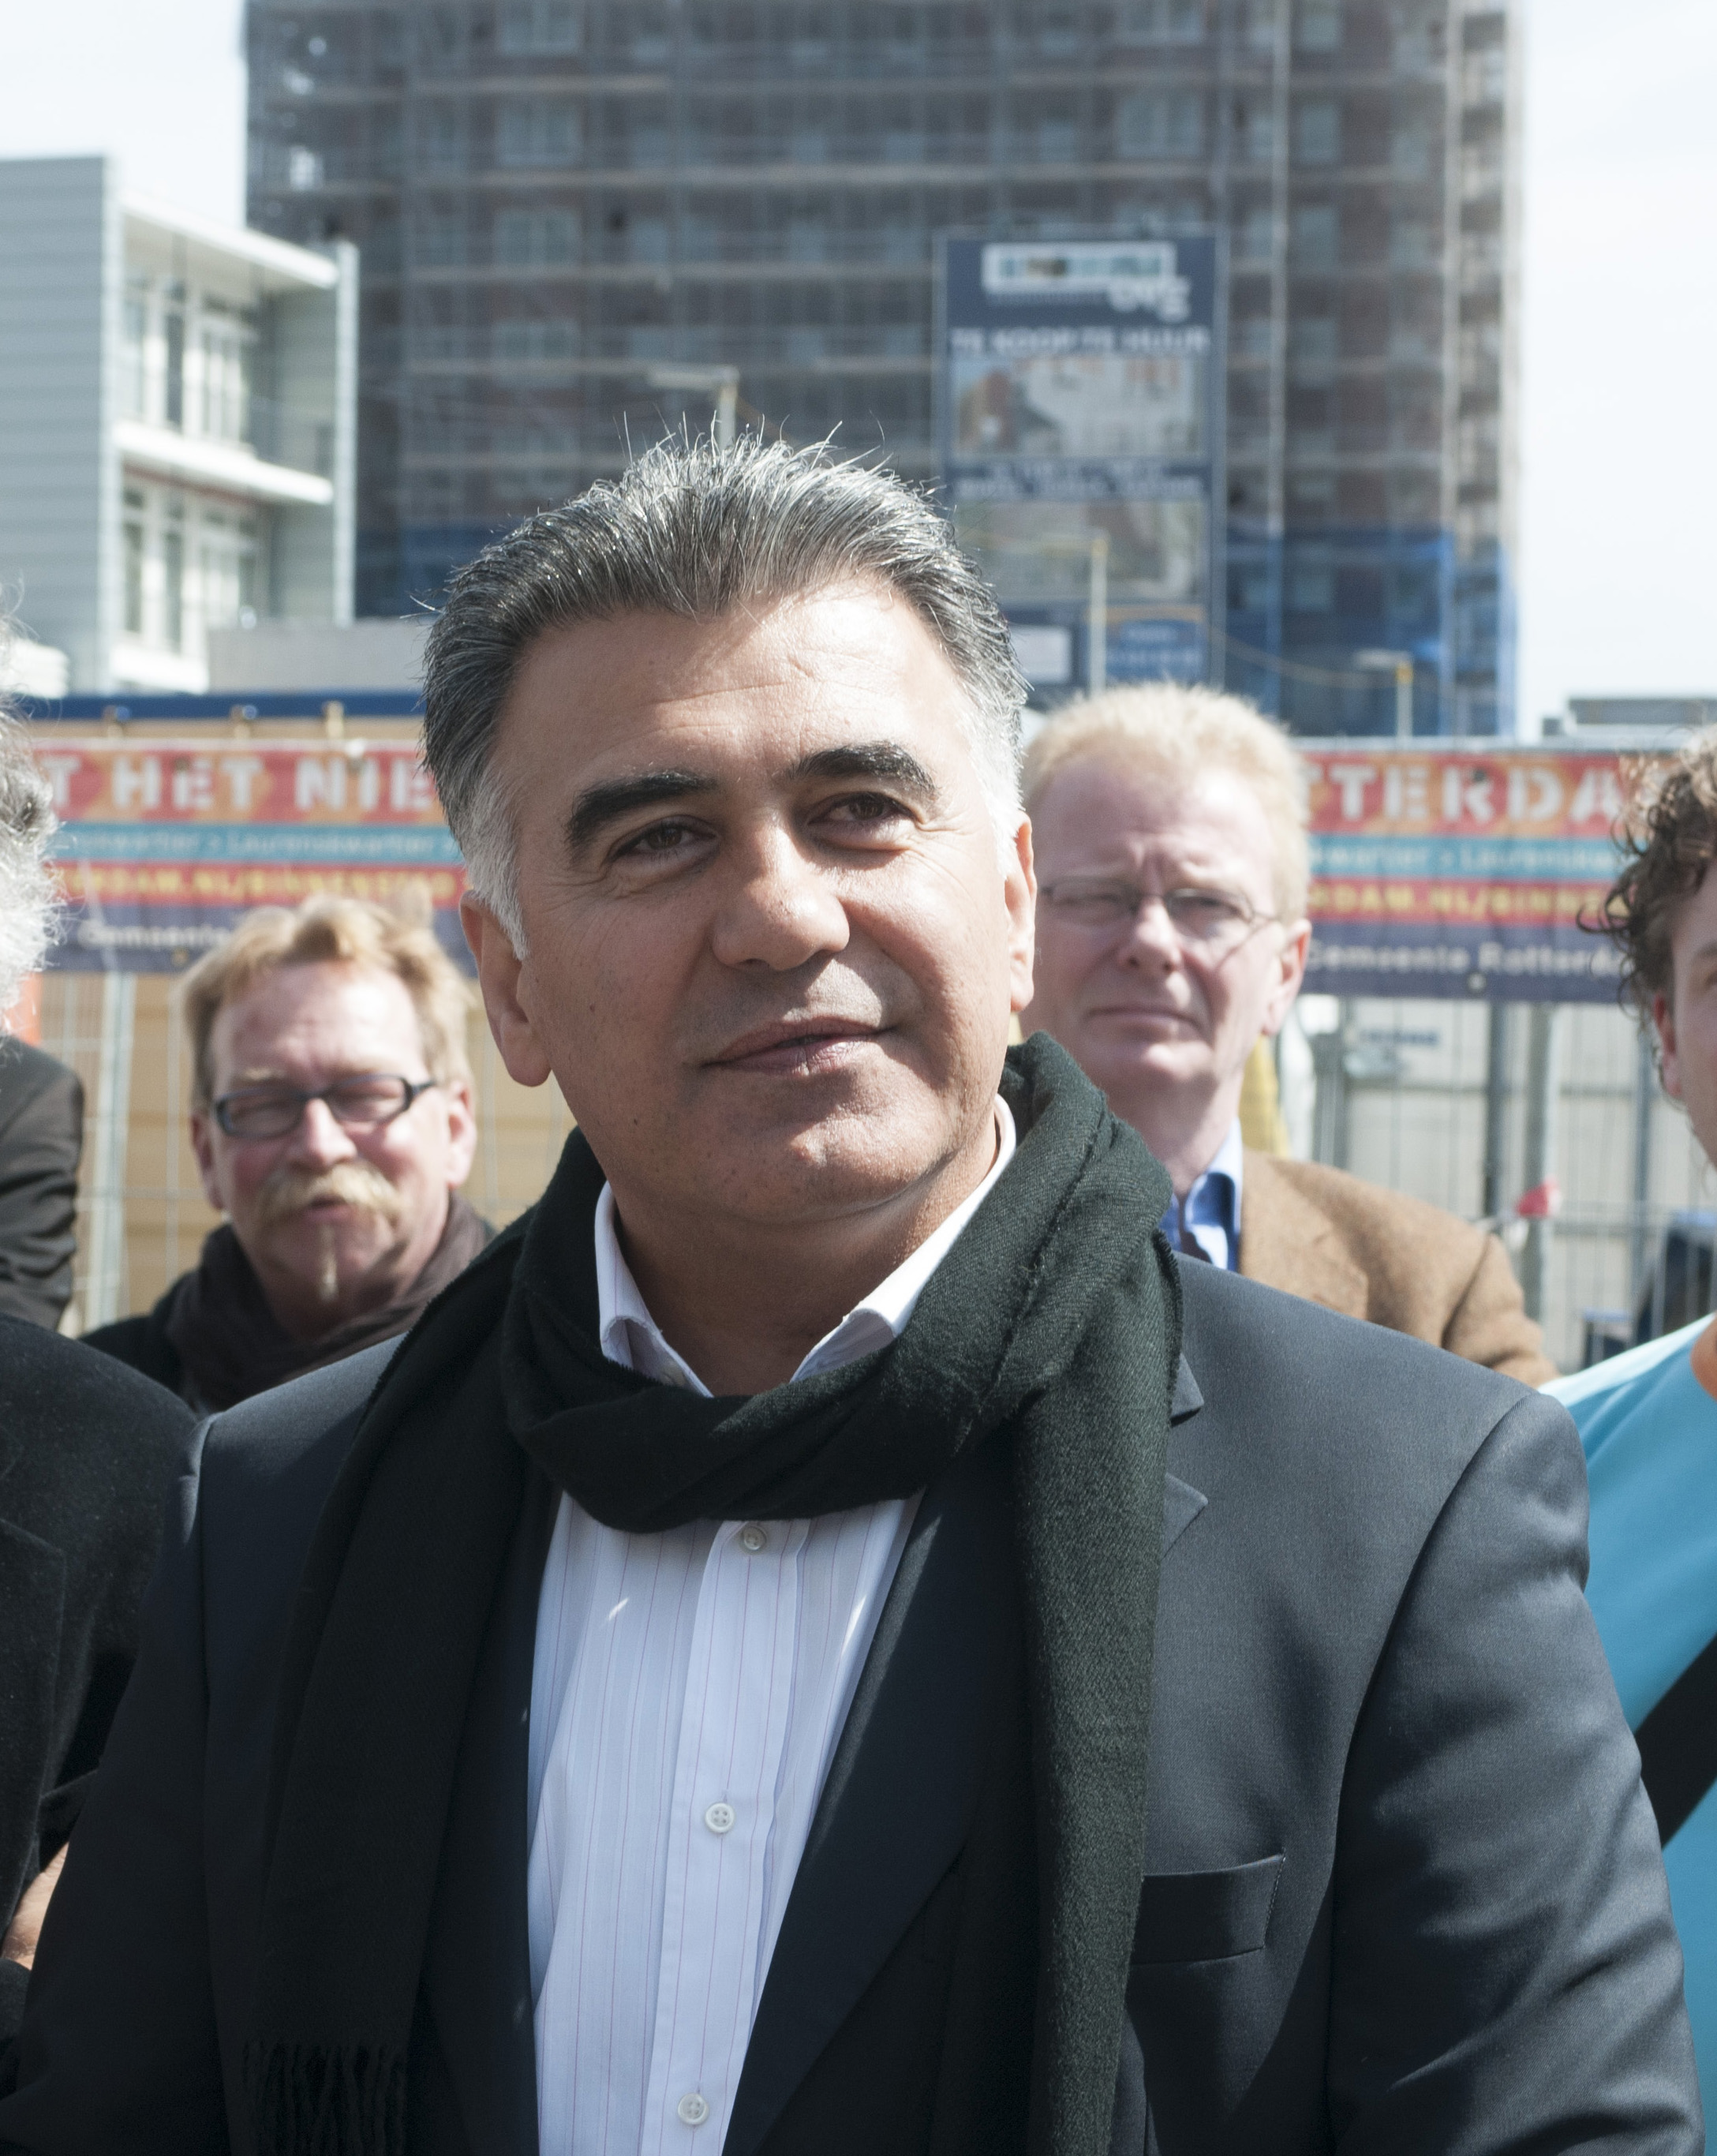 Hamit Karakus voorzitter Keurmerk Leegstandbeheer